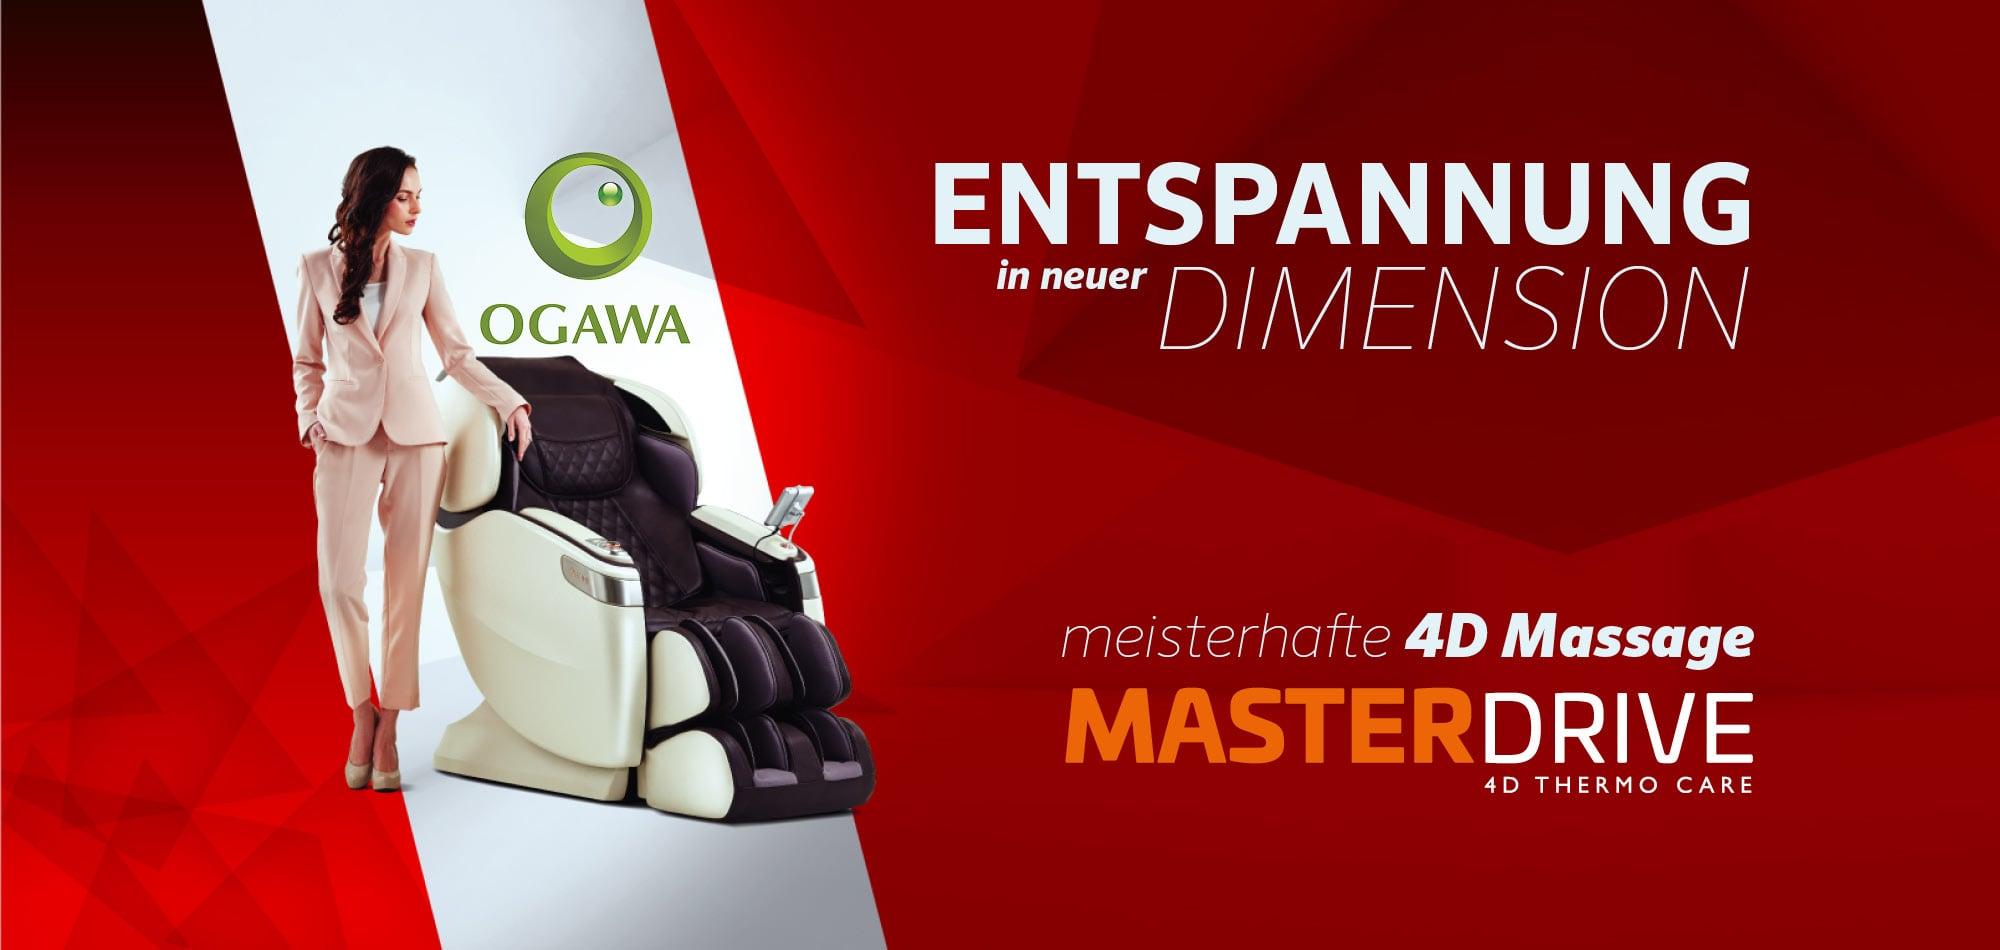 ogawa-masterdrive-teaser-startseite